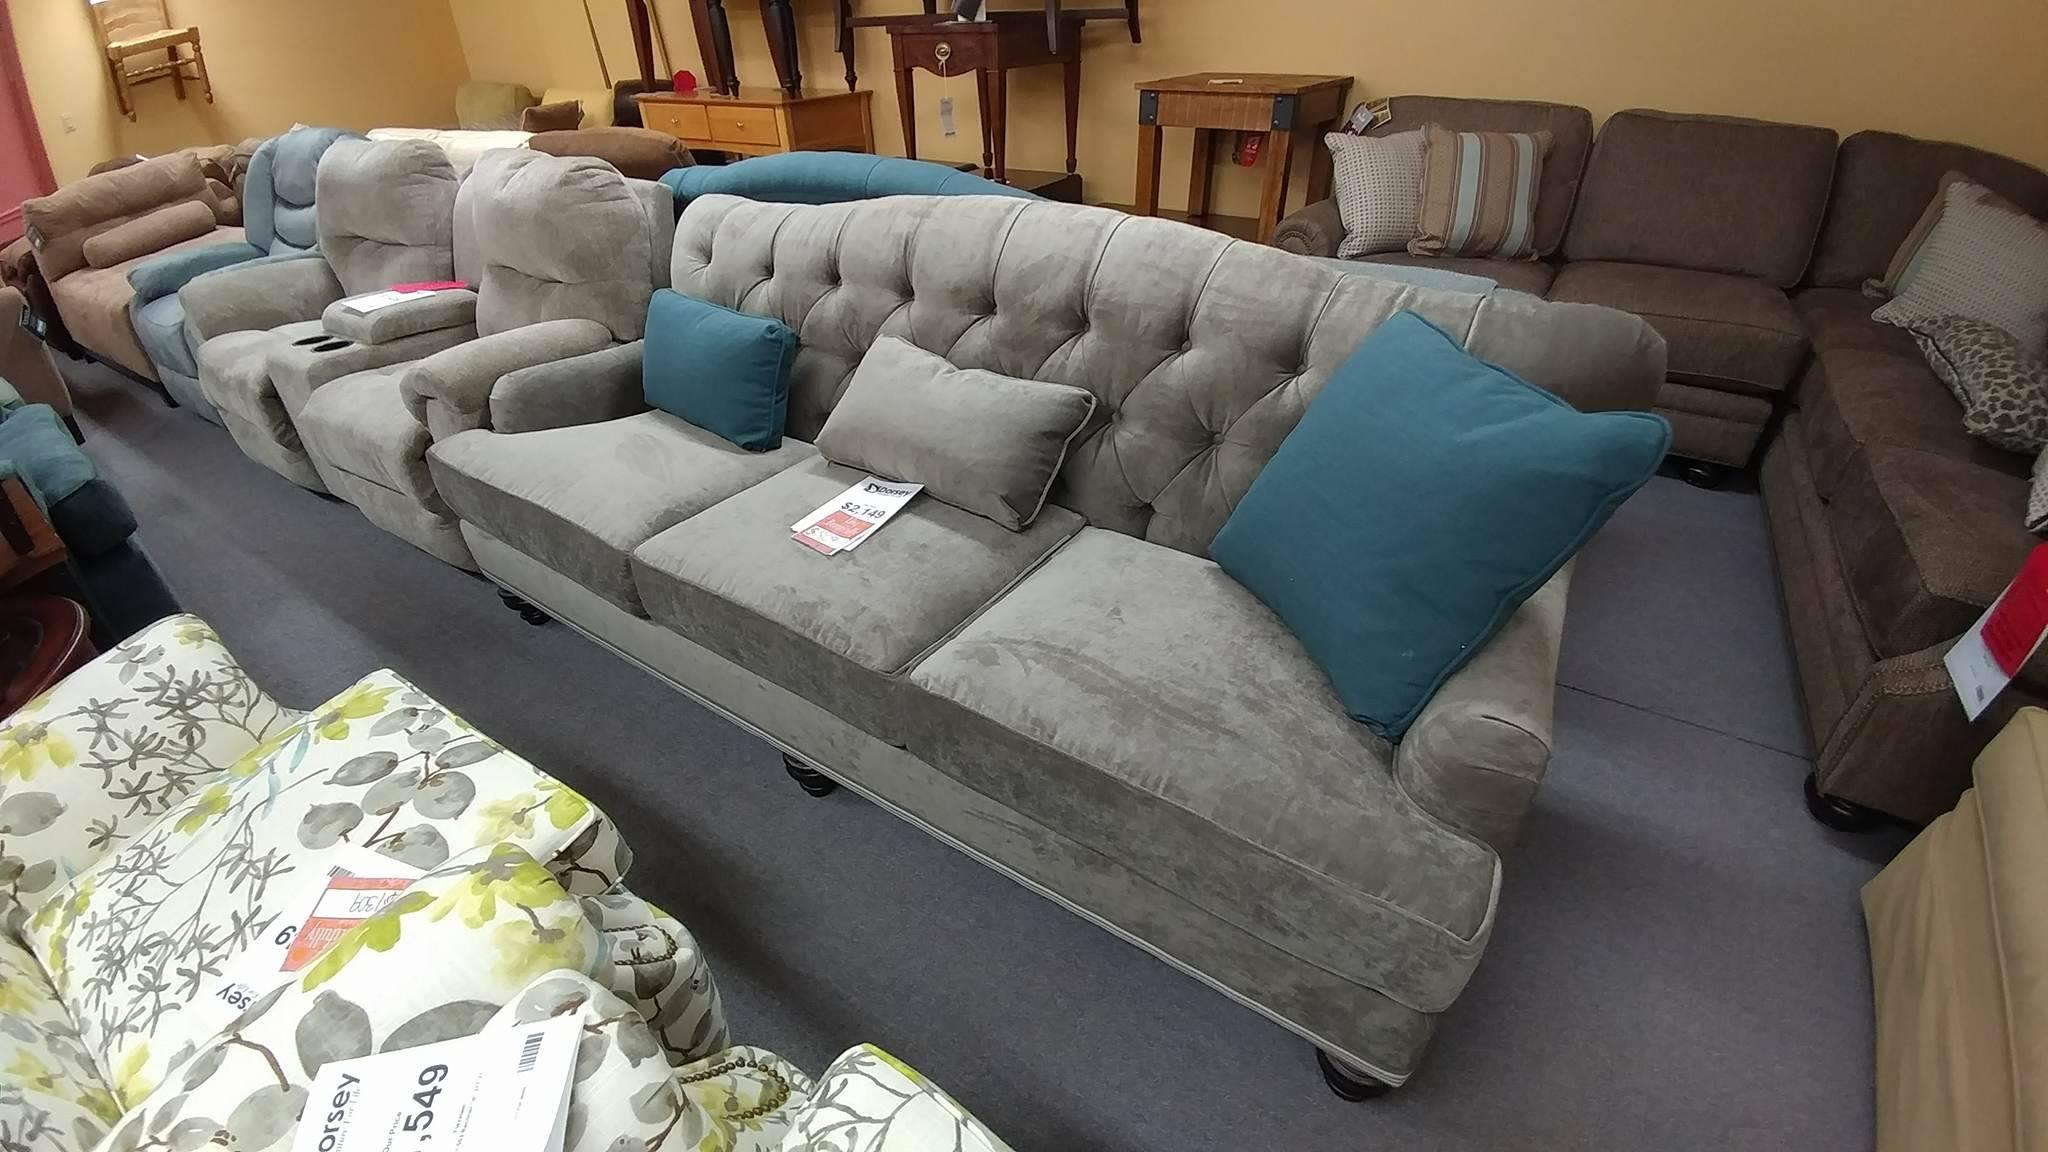 Title: Craftmaster Paula Dean P744950BD Sofa Set. Manufacturer: Craftmaster  Furniture